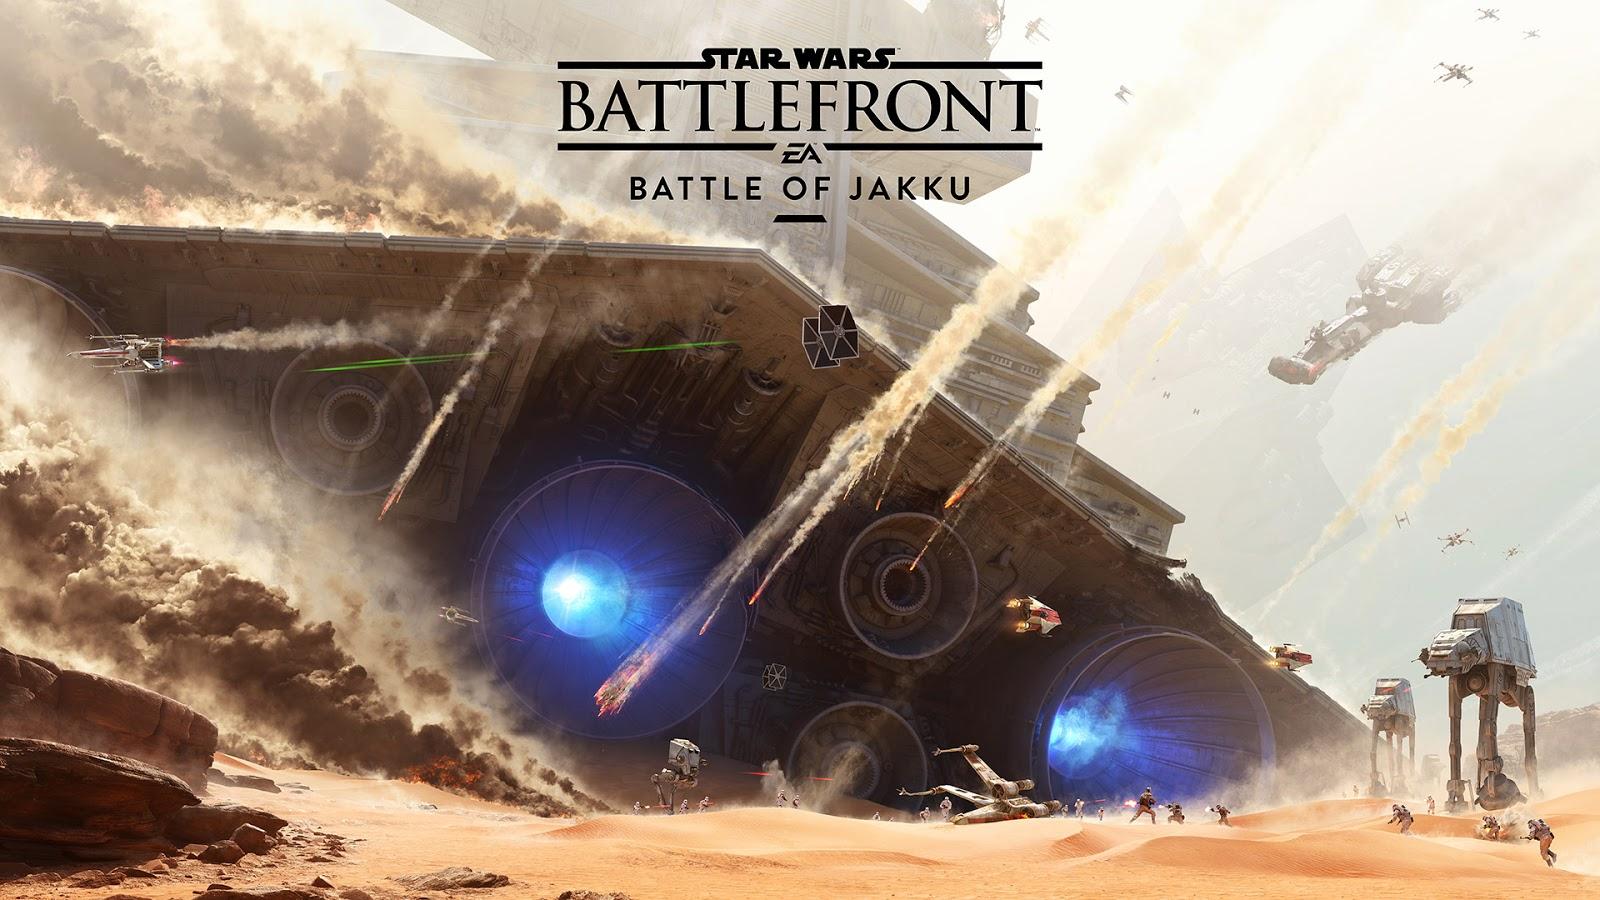 DICE detalha o DLC Battle of Jakku para Star Wars: Battlefront